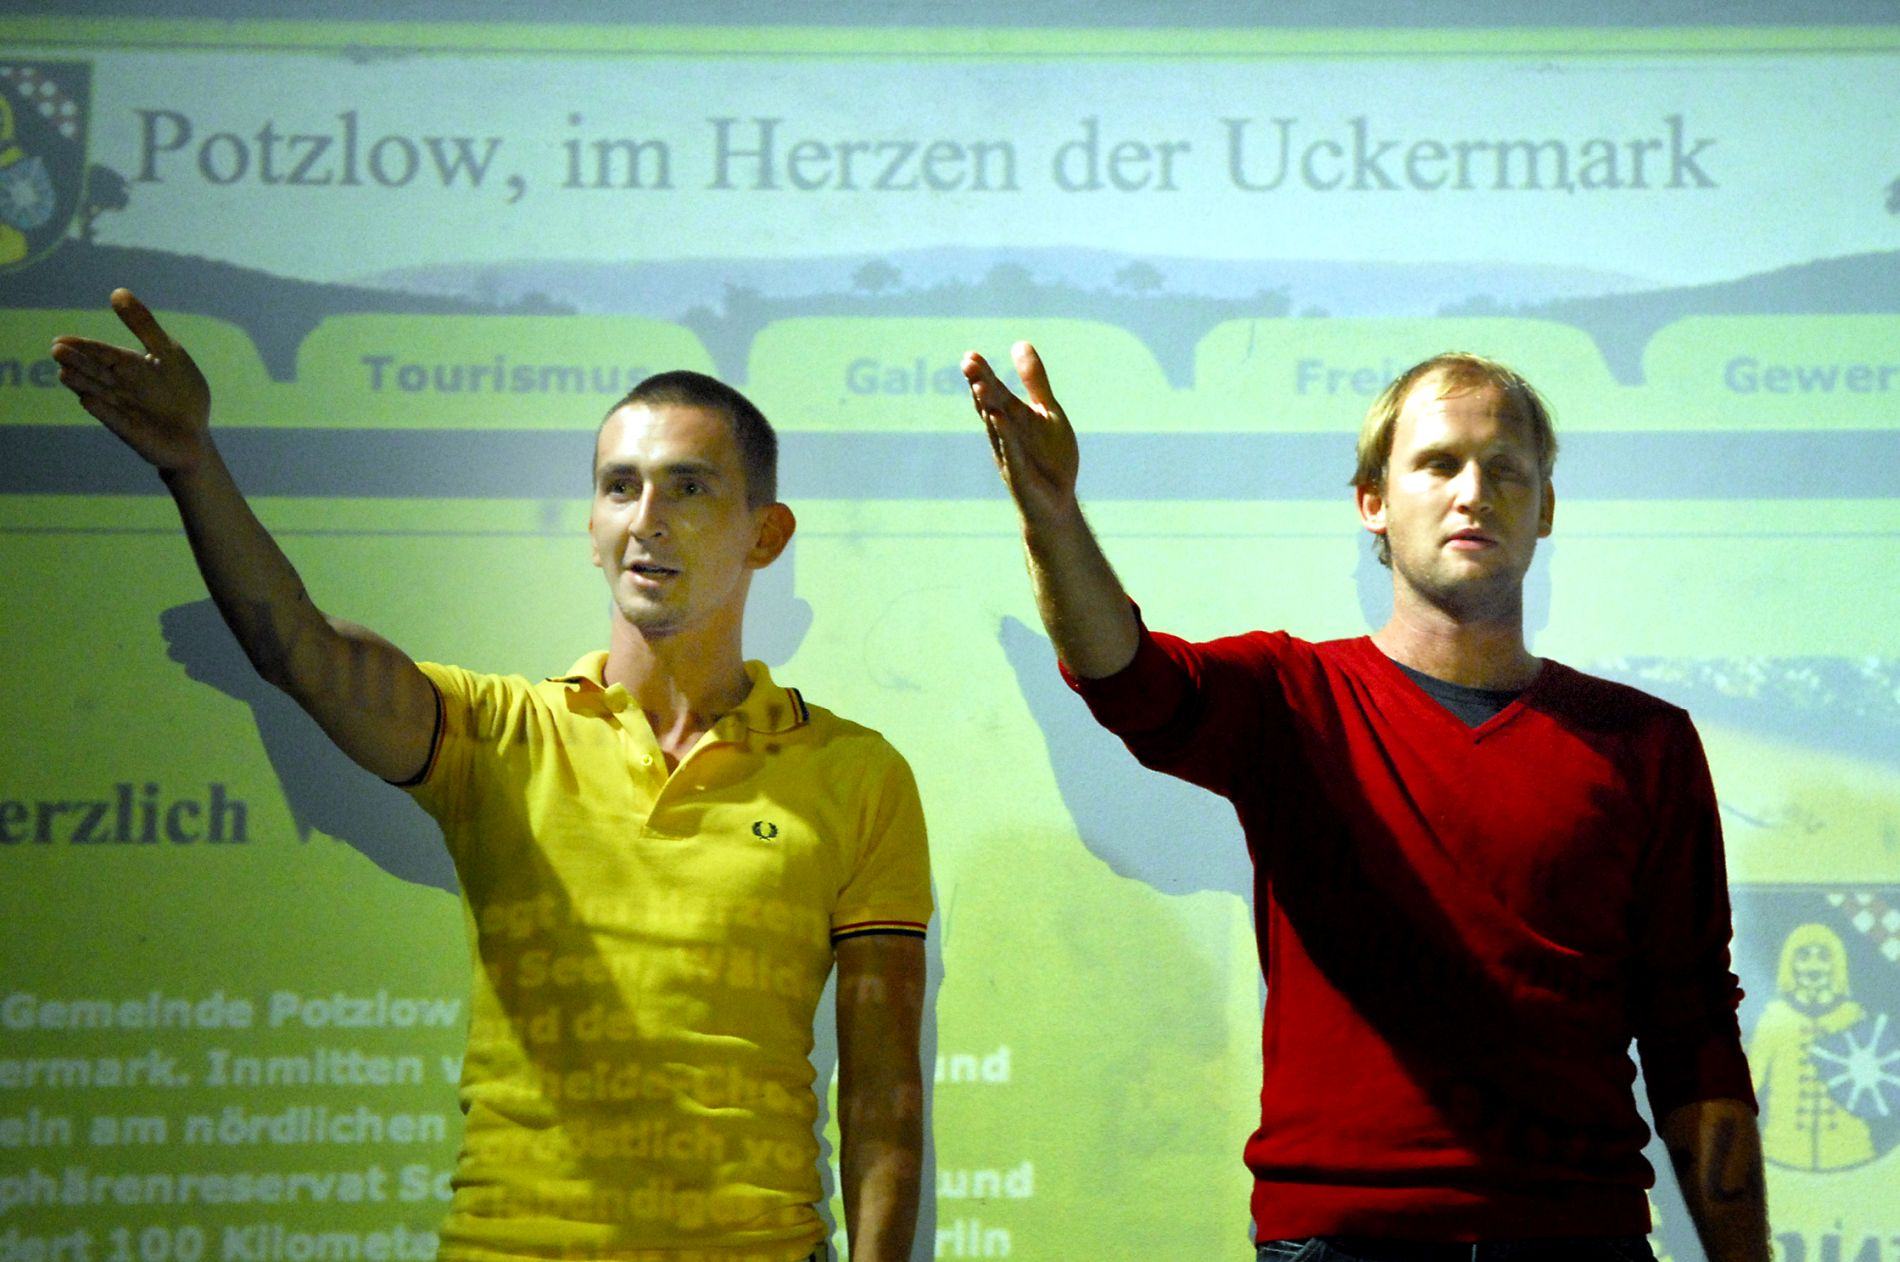 RB_012_XVI_TH_2007_der_kick_002_foto_karsten_schaarschmidtjpg.jpg